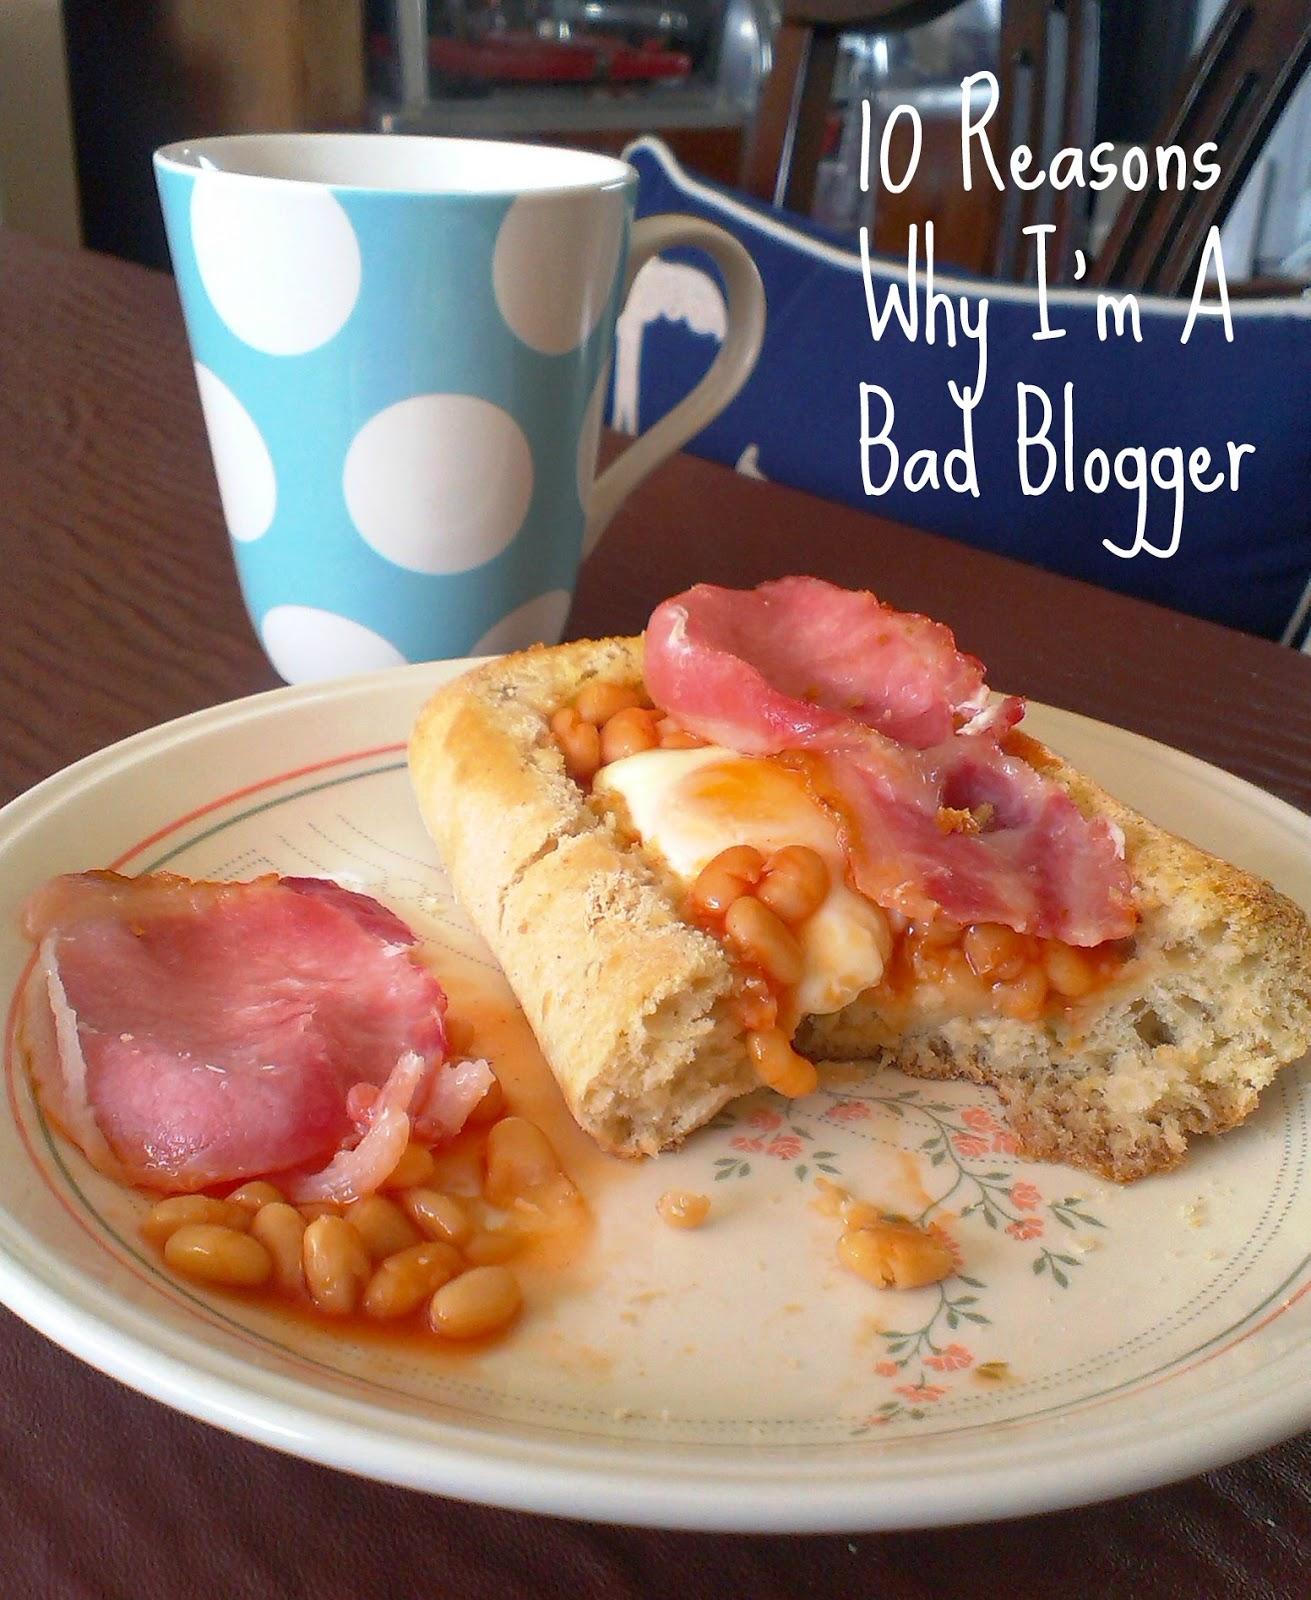 10 Reasons Why I'm A Bad Blogger - Half Eaten Food